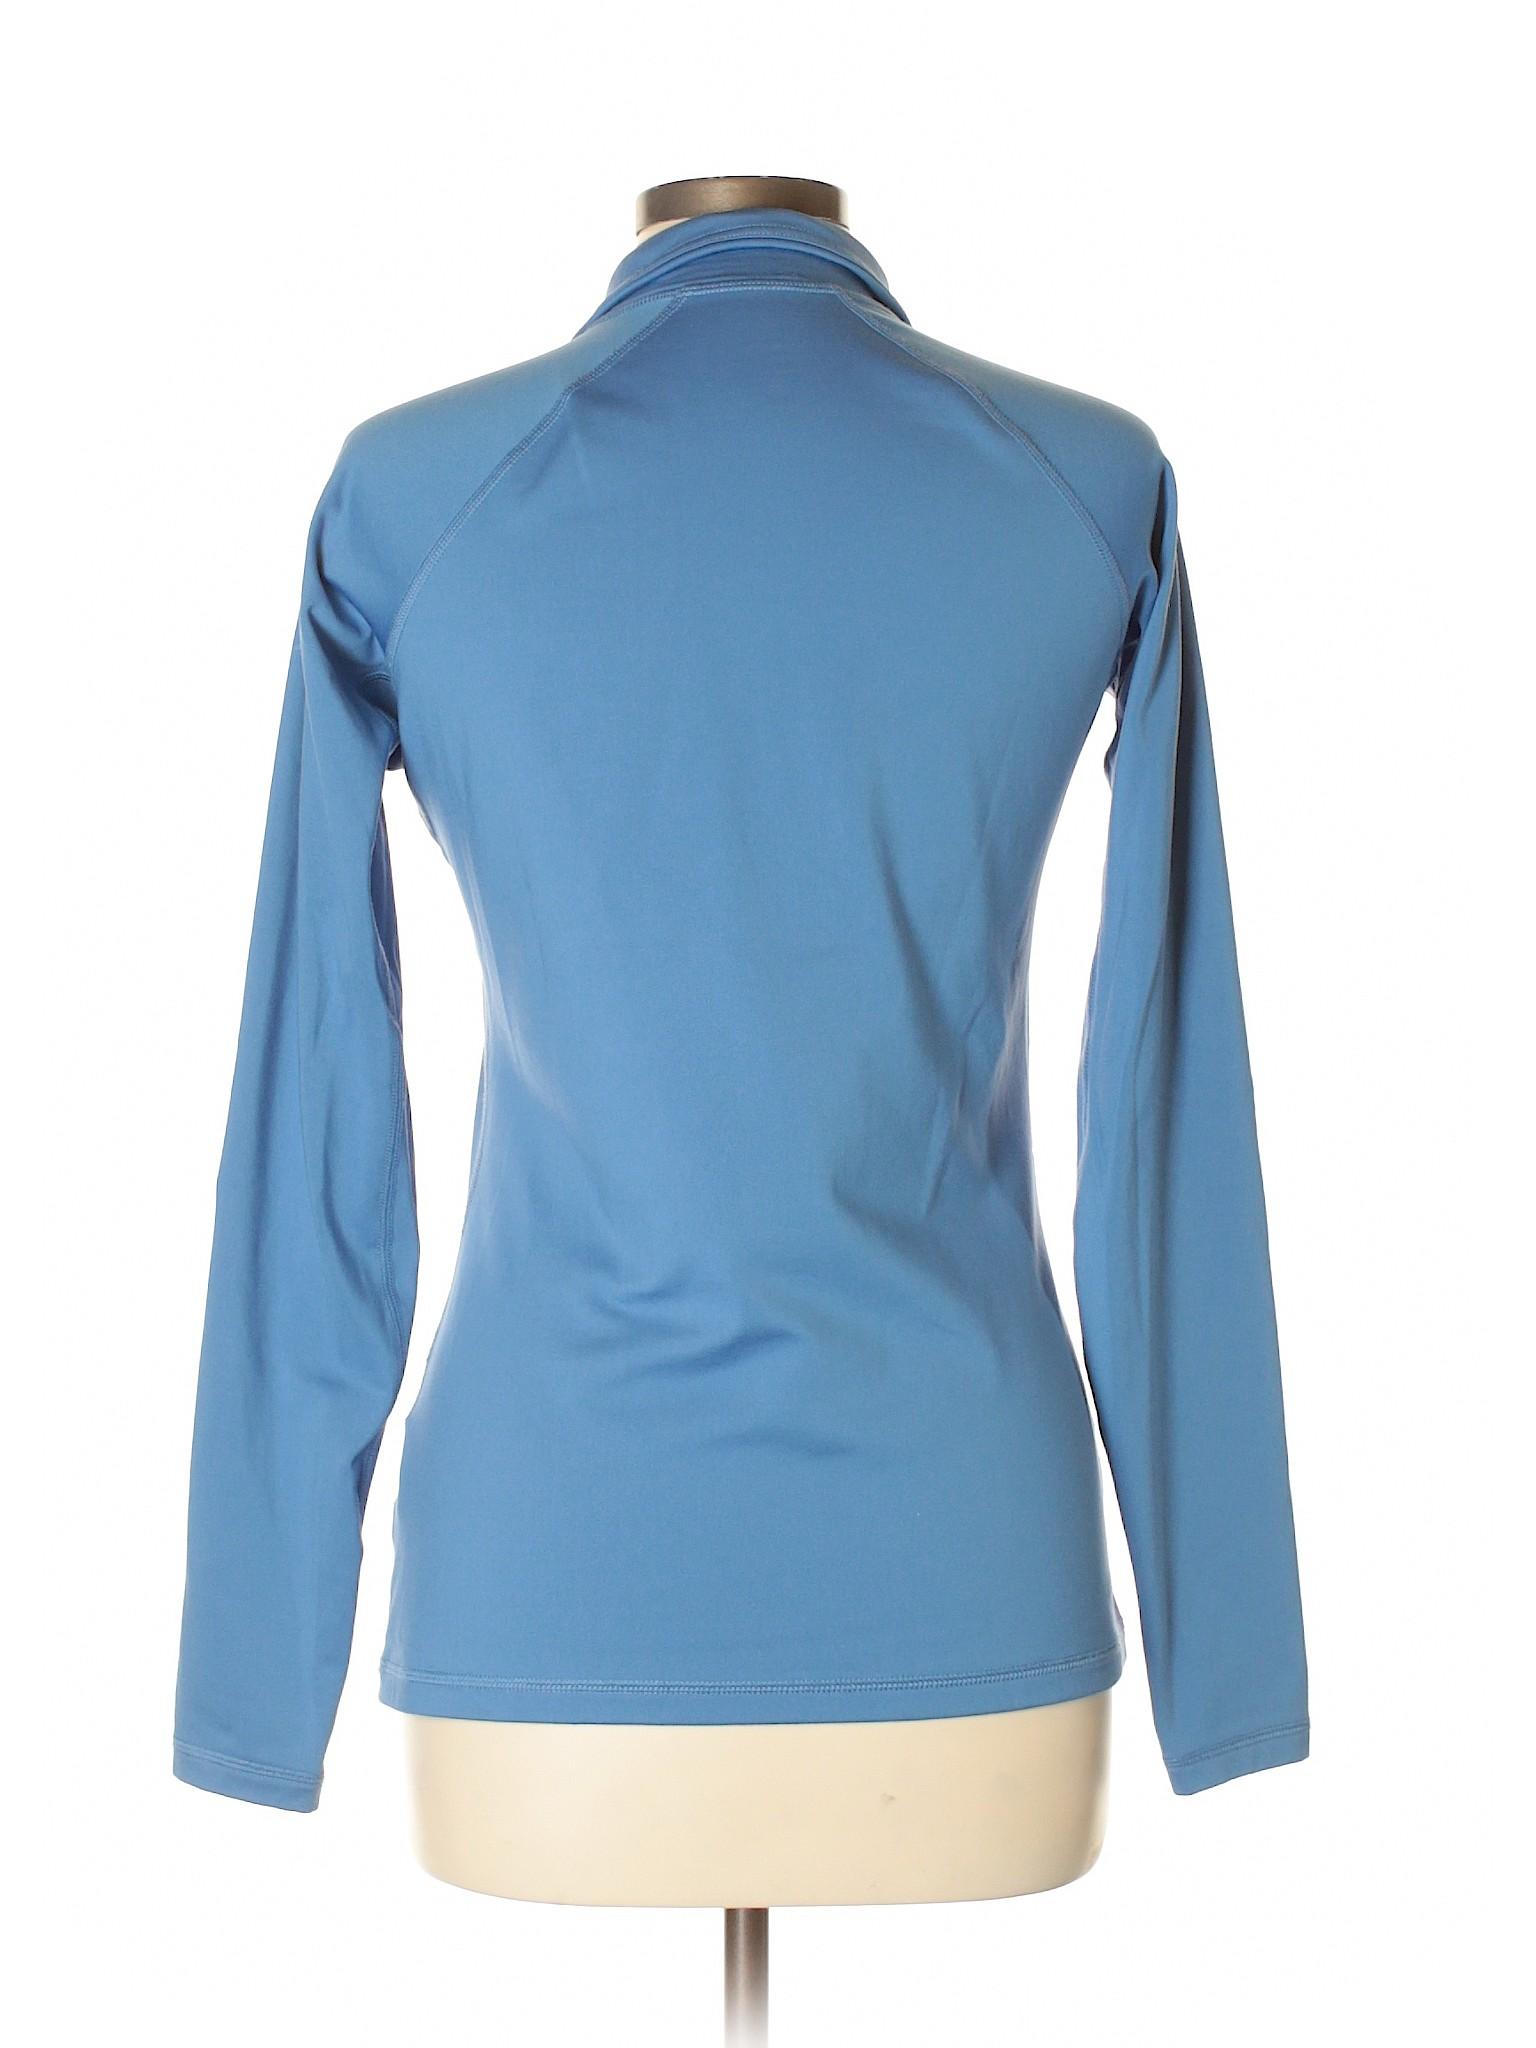 Boutique Boutique Track Jacket leisure Nike leisure Track Nike qOxwnA84